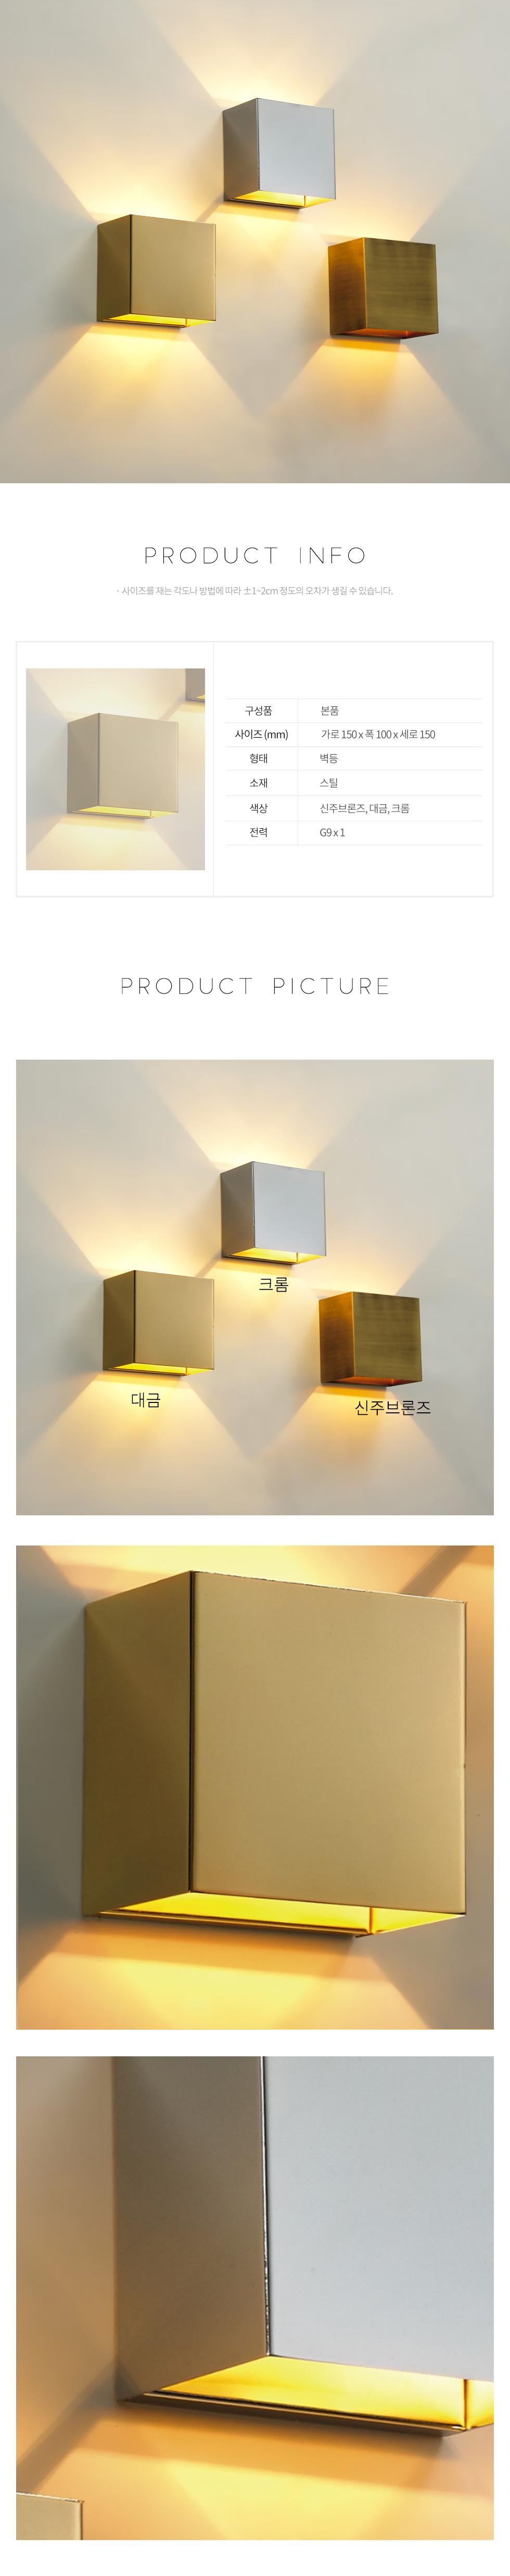 LED 크론 벽등 - 하우스코디, 63,000원, 리빙조명, 벽조명